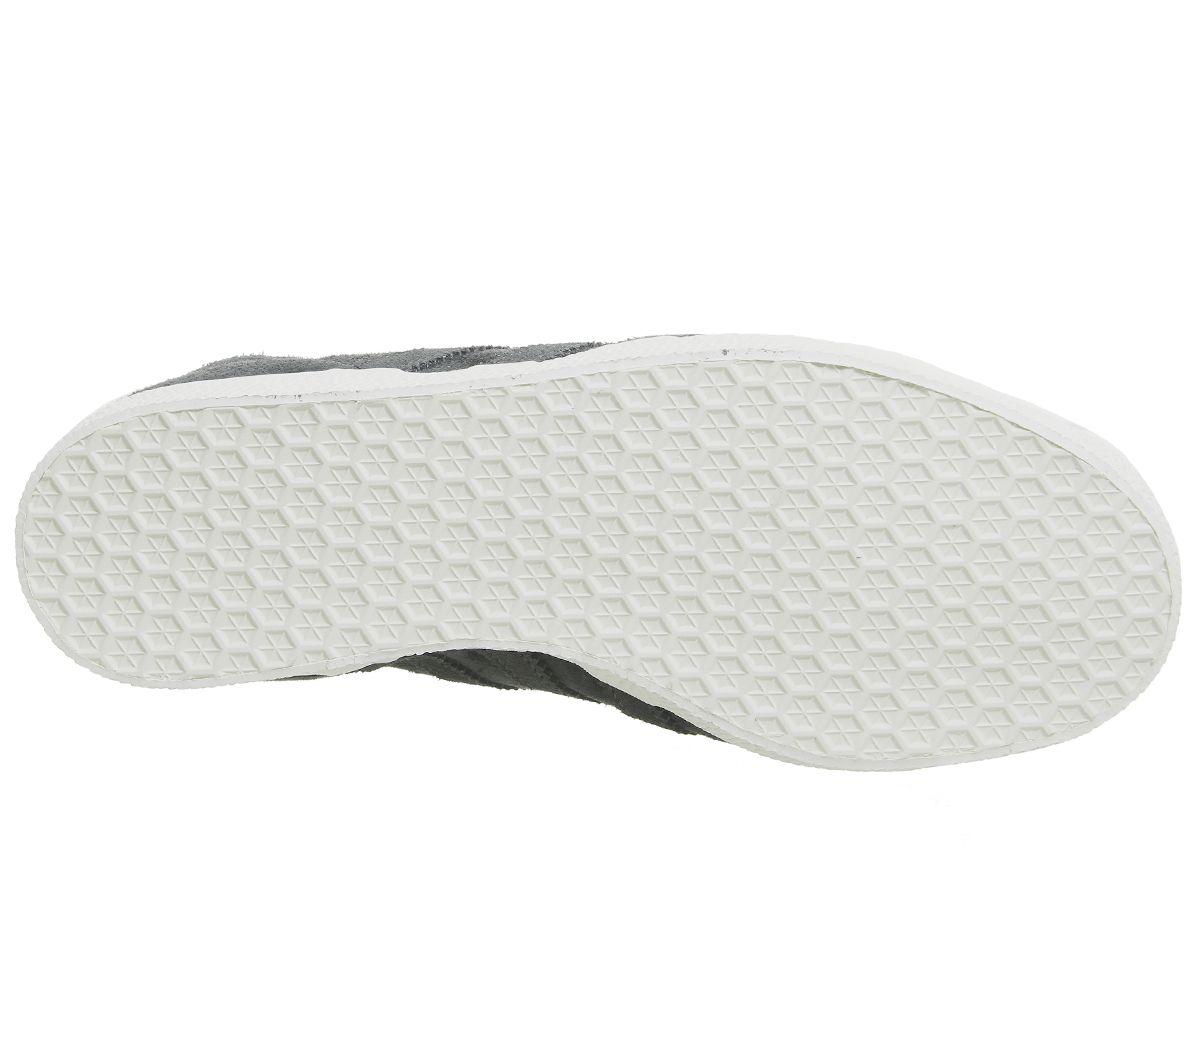 best service 0d2c1 c9041 Mens-Adidas-Gazelle-Trainers-Night-Grey-Carbon-Silver-